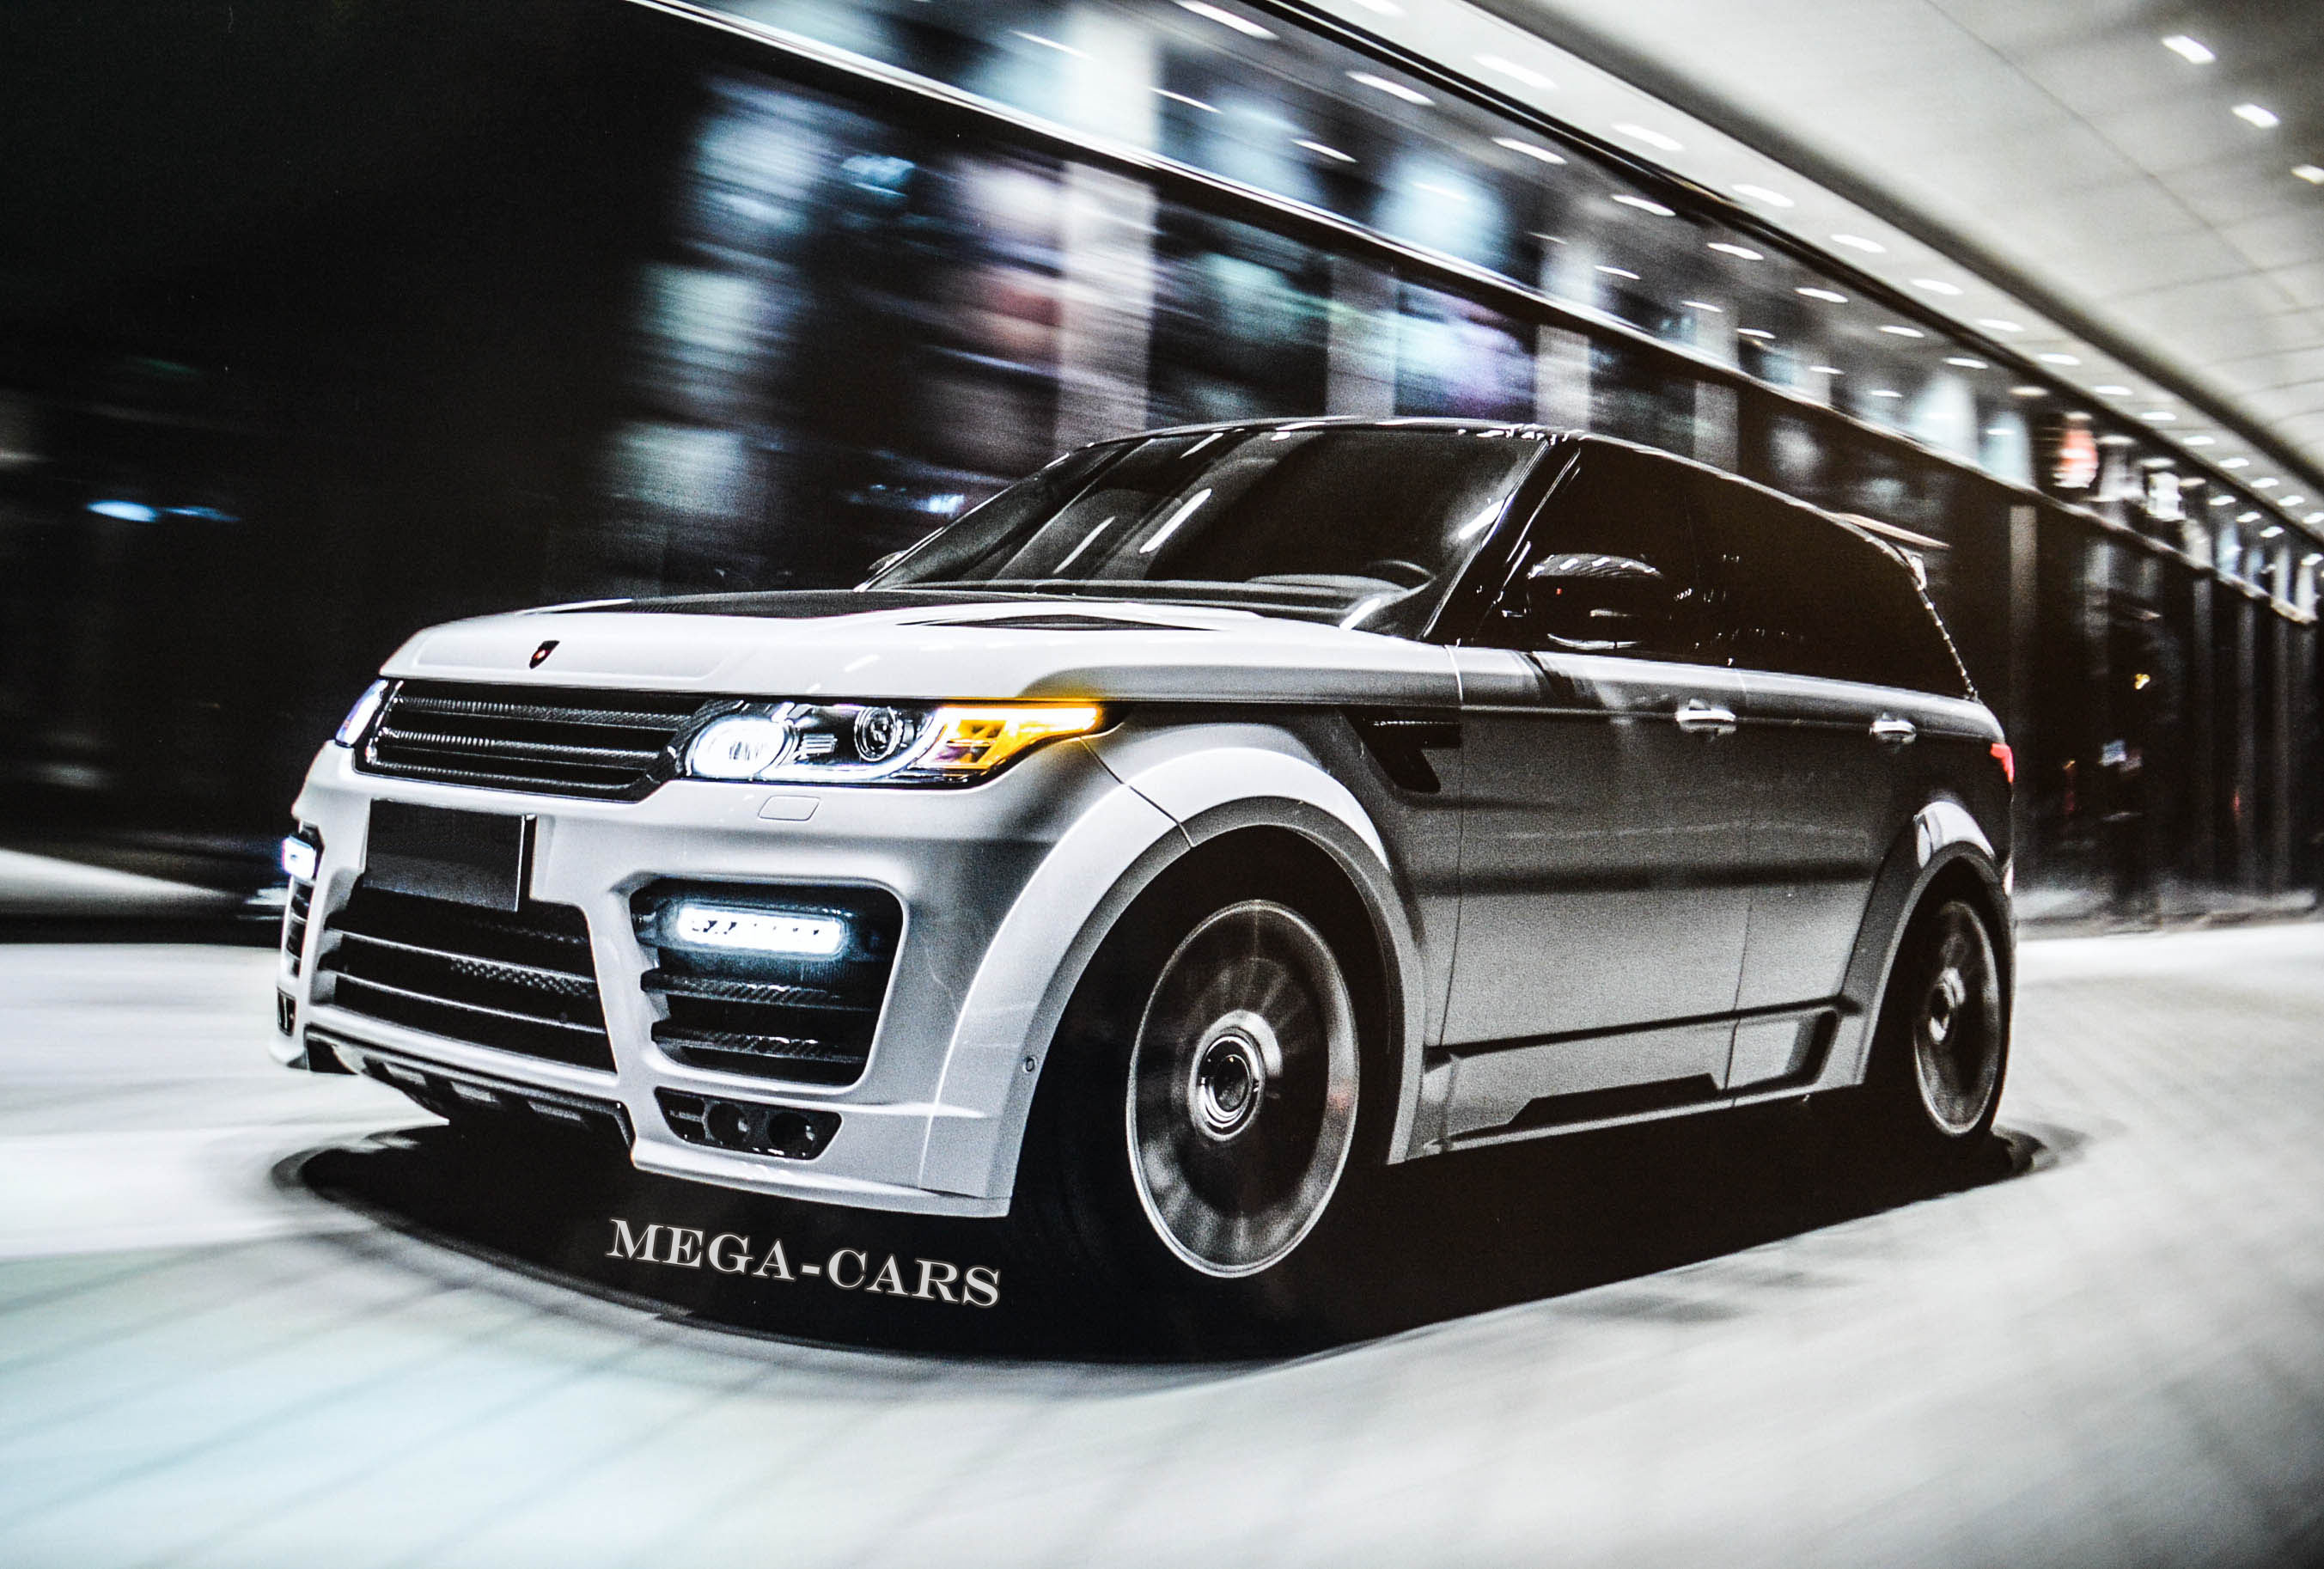 Megacars